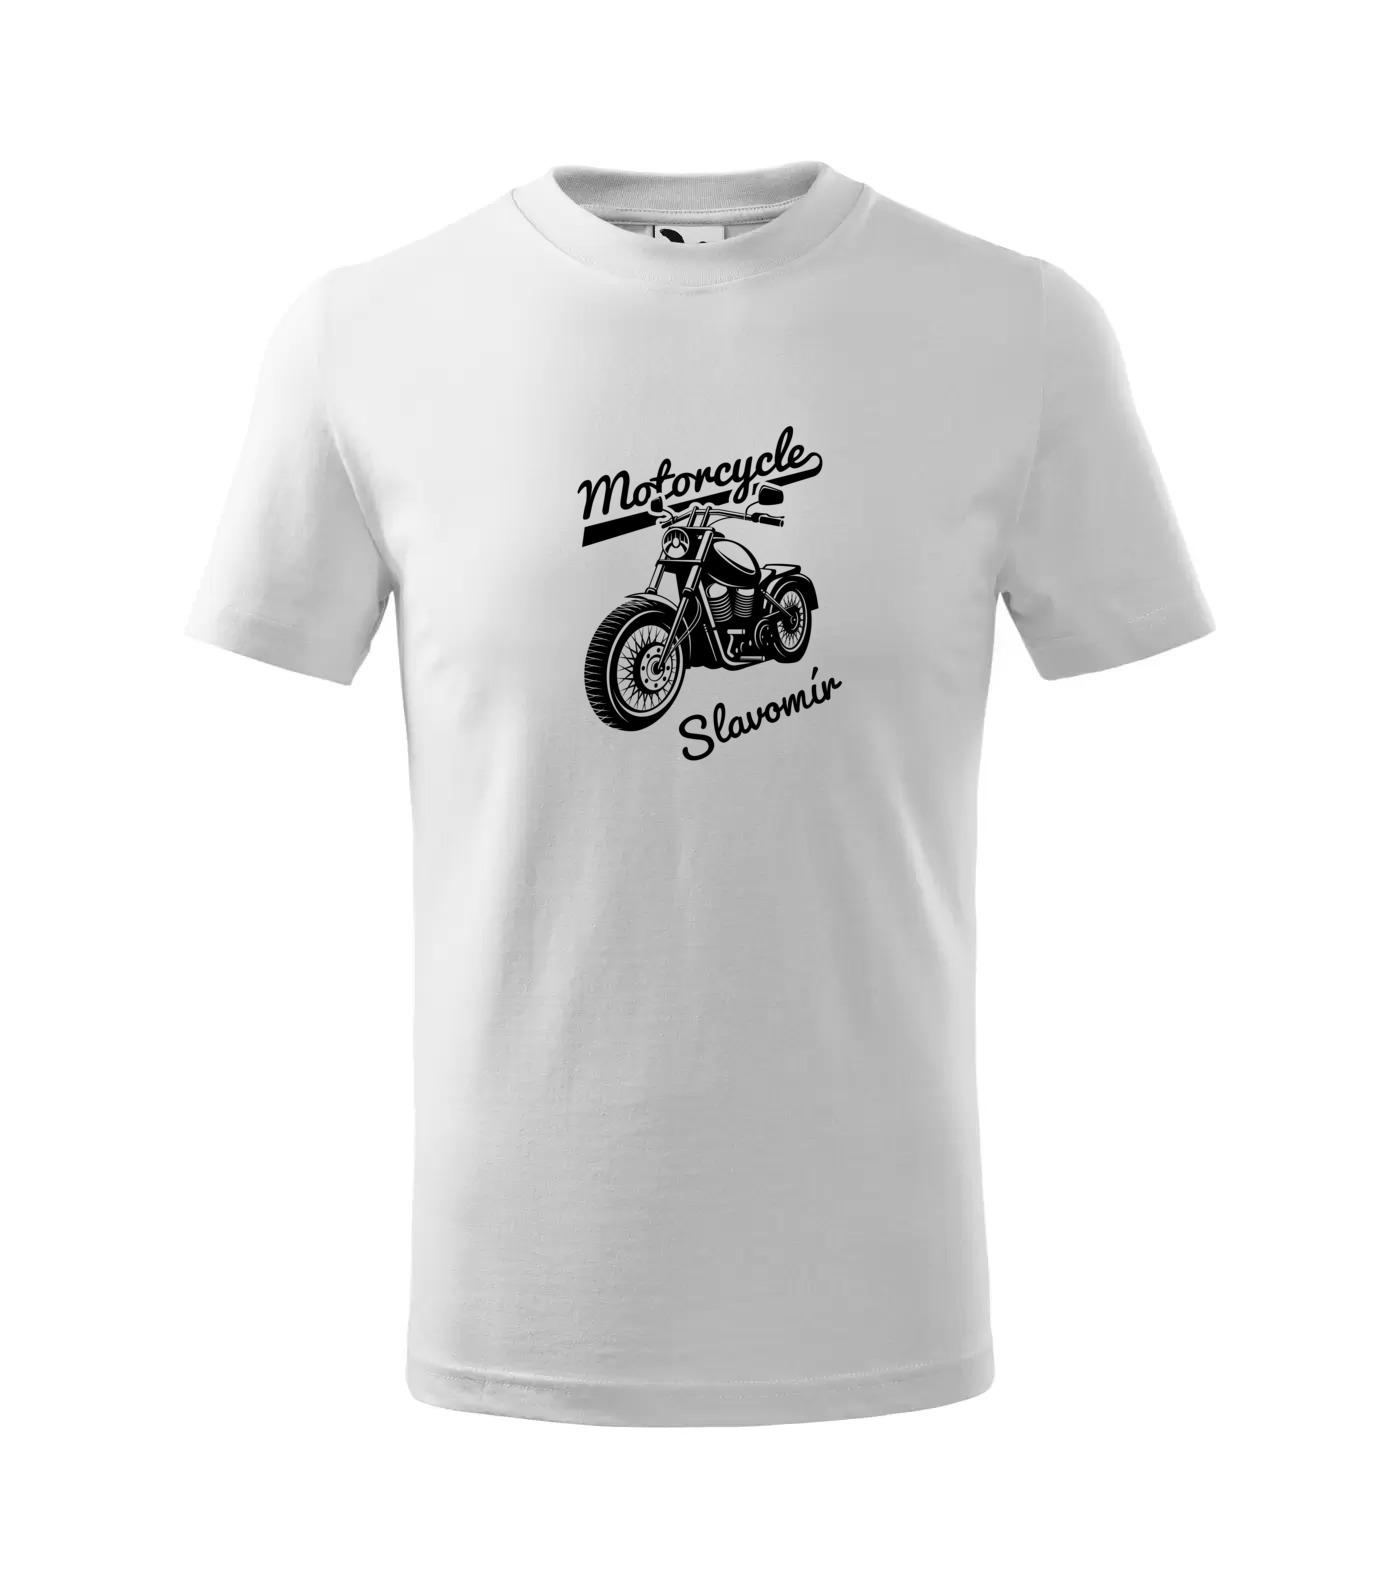 Tričko Motorkář Inverse Slavomír